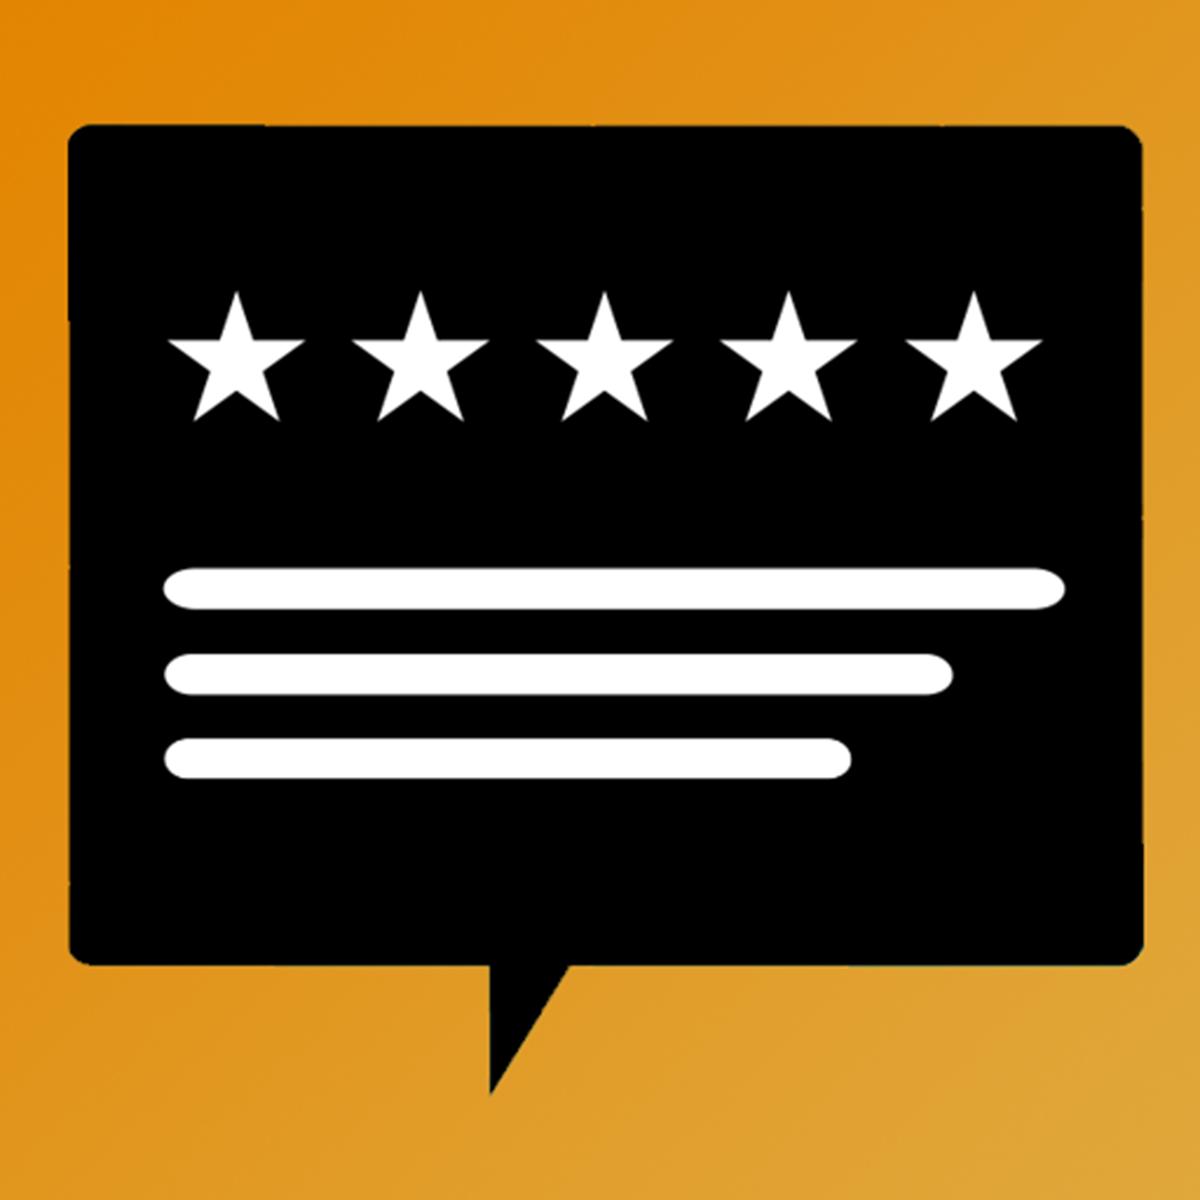 Shopify Testimonials app by Lj apps